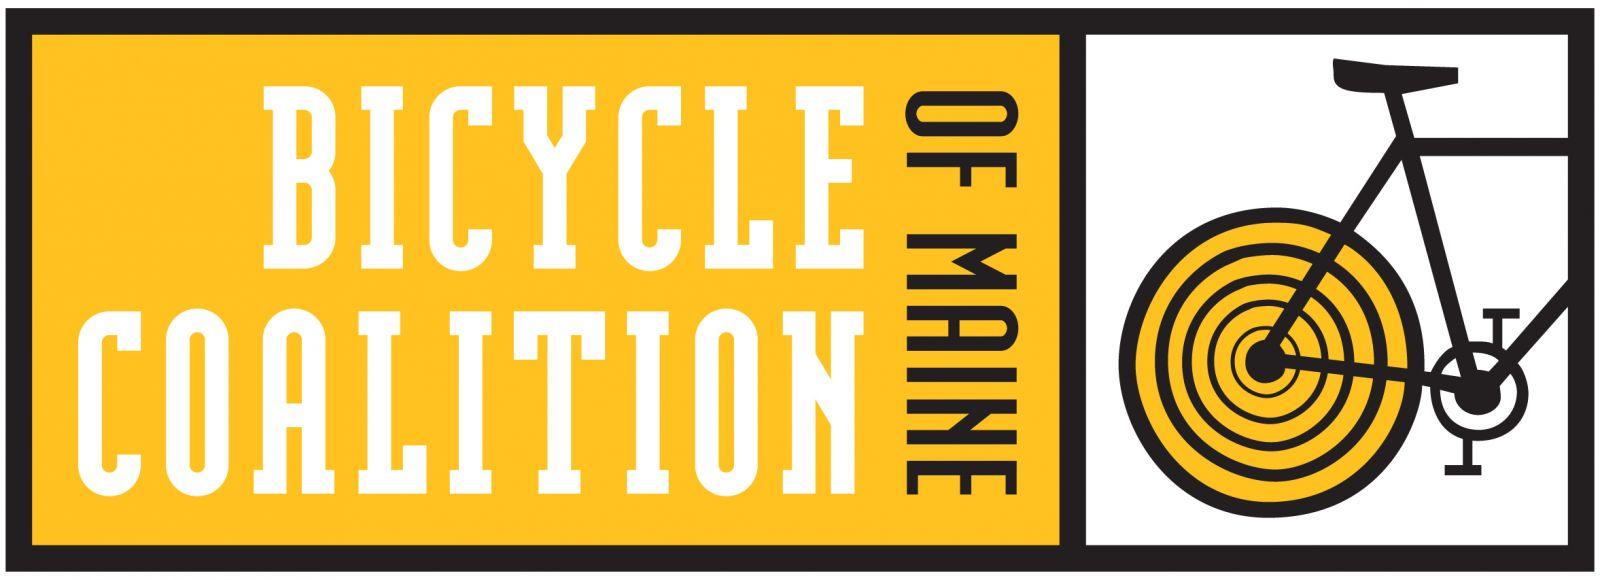 Bicycle Coalition of Maine Logo.jpg